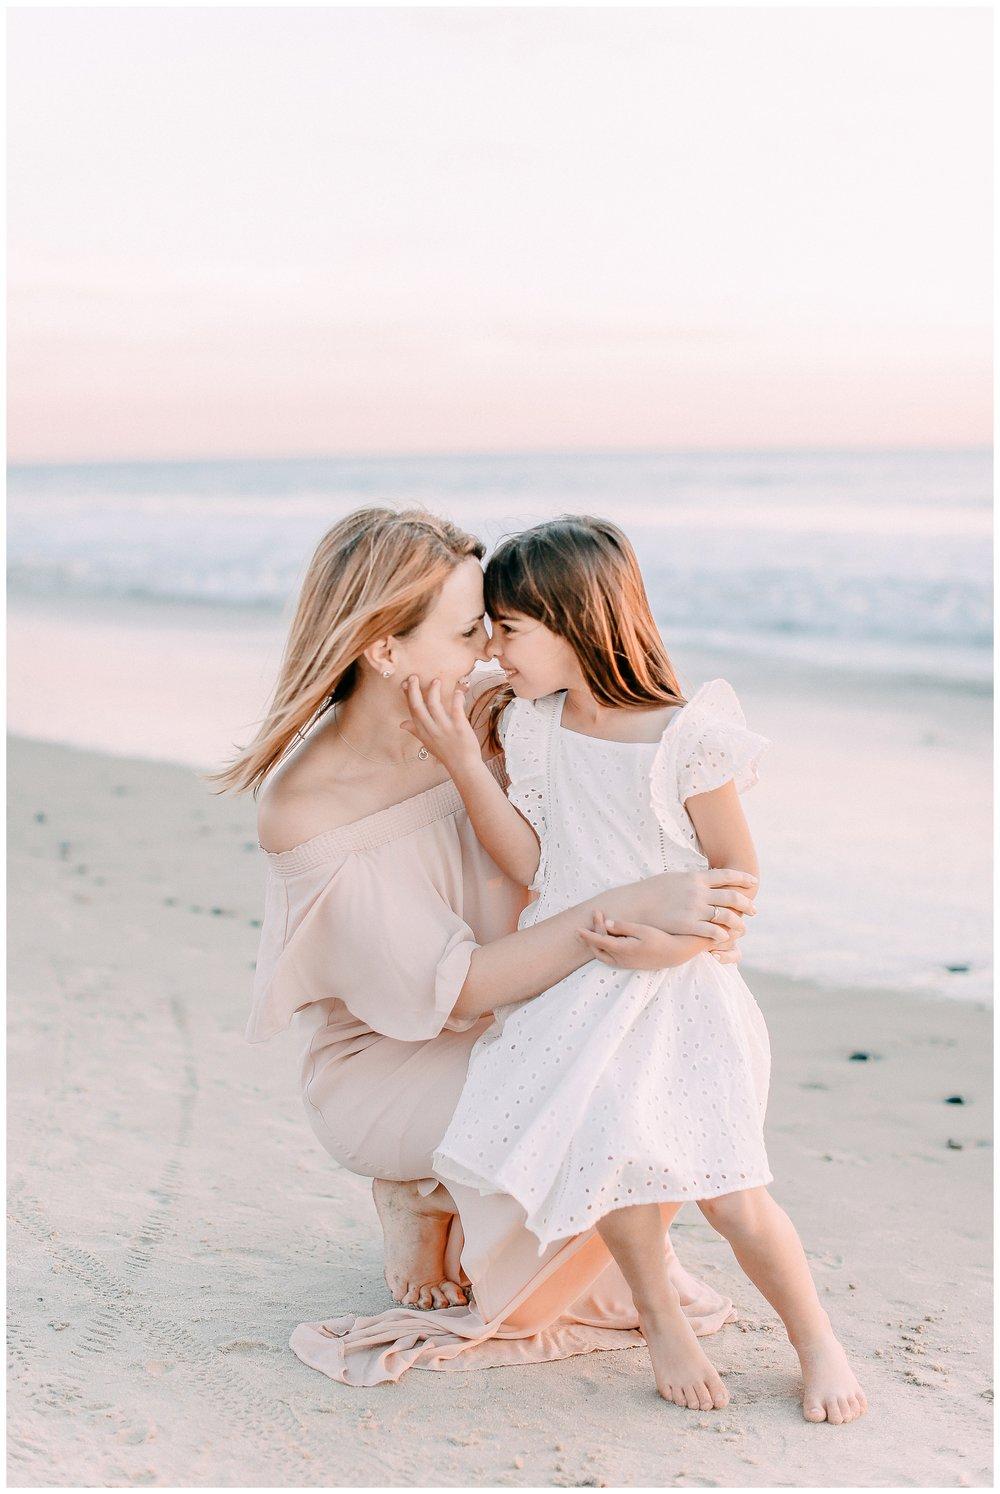 San_clemente_family_session_Orange_county_family_photographer_cori_kleckner_photography_laguna_beach_family_session_0705.jpg